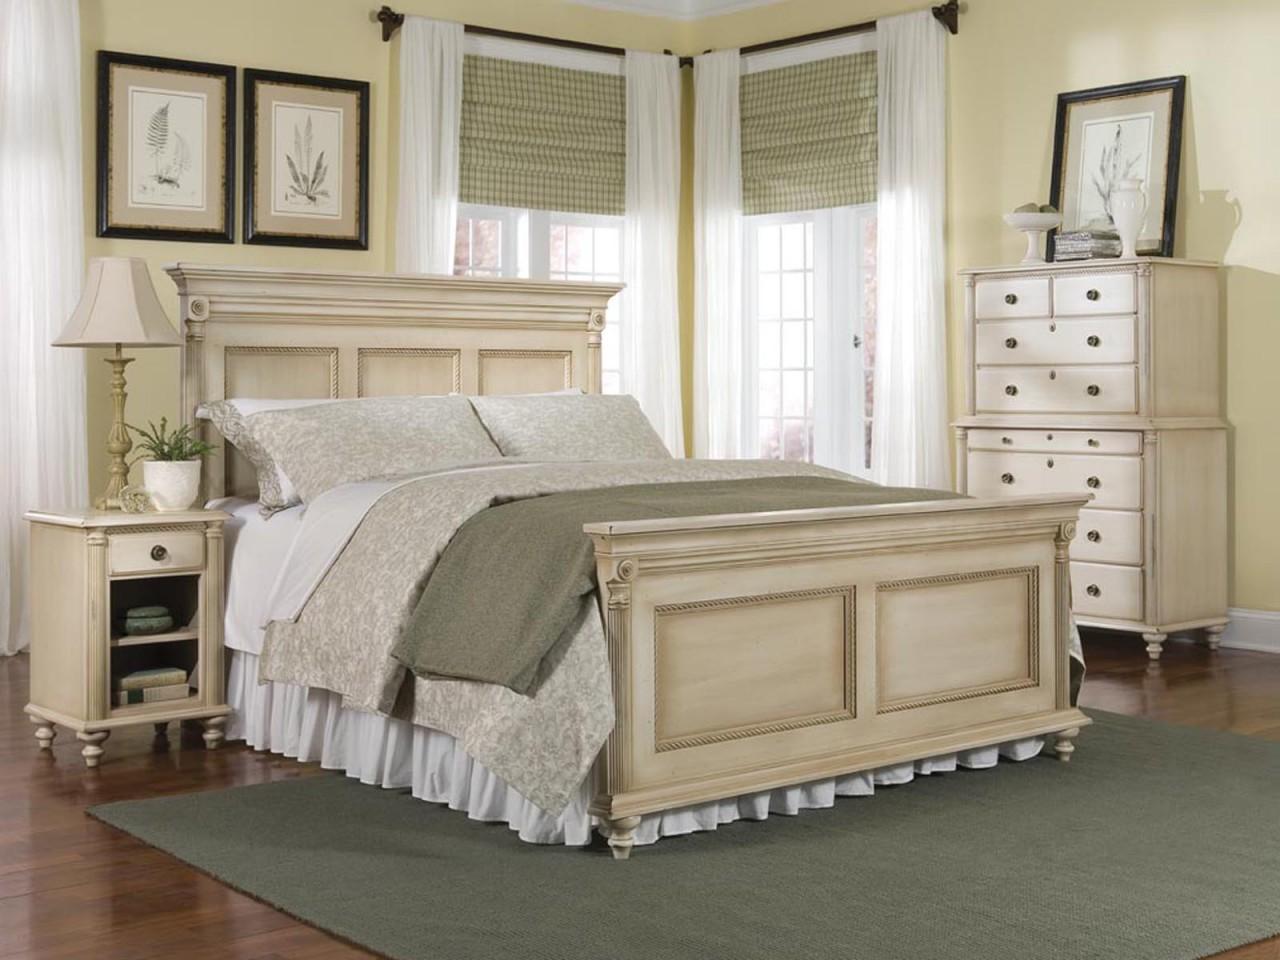 cream colored bedroom furniture photo - 1